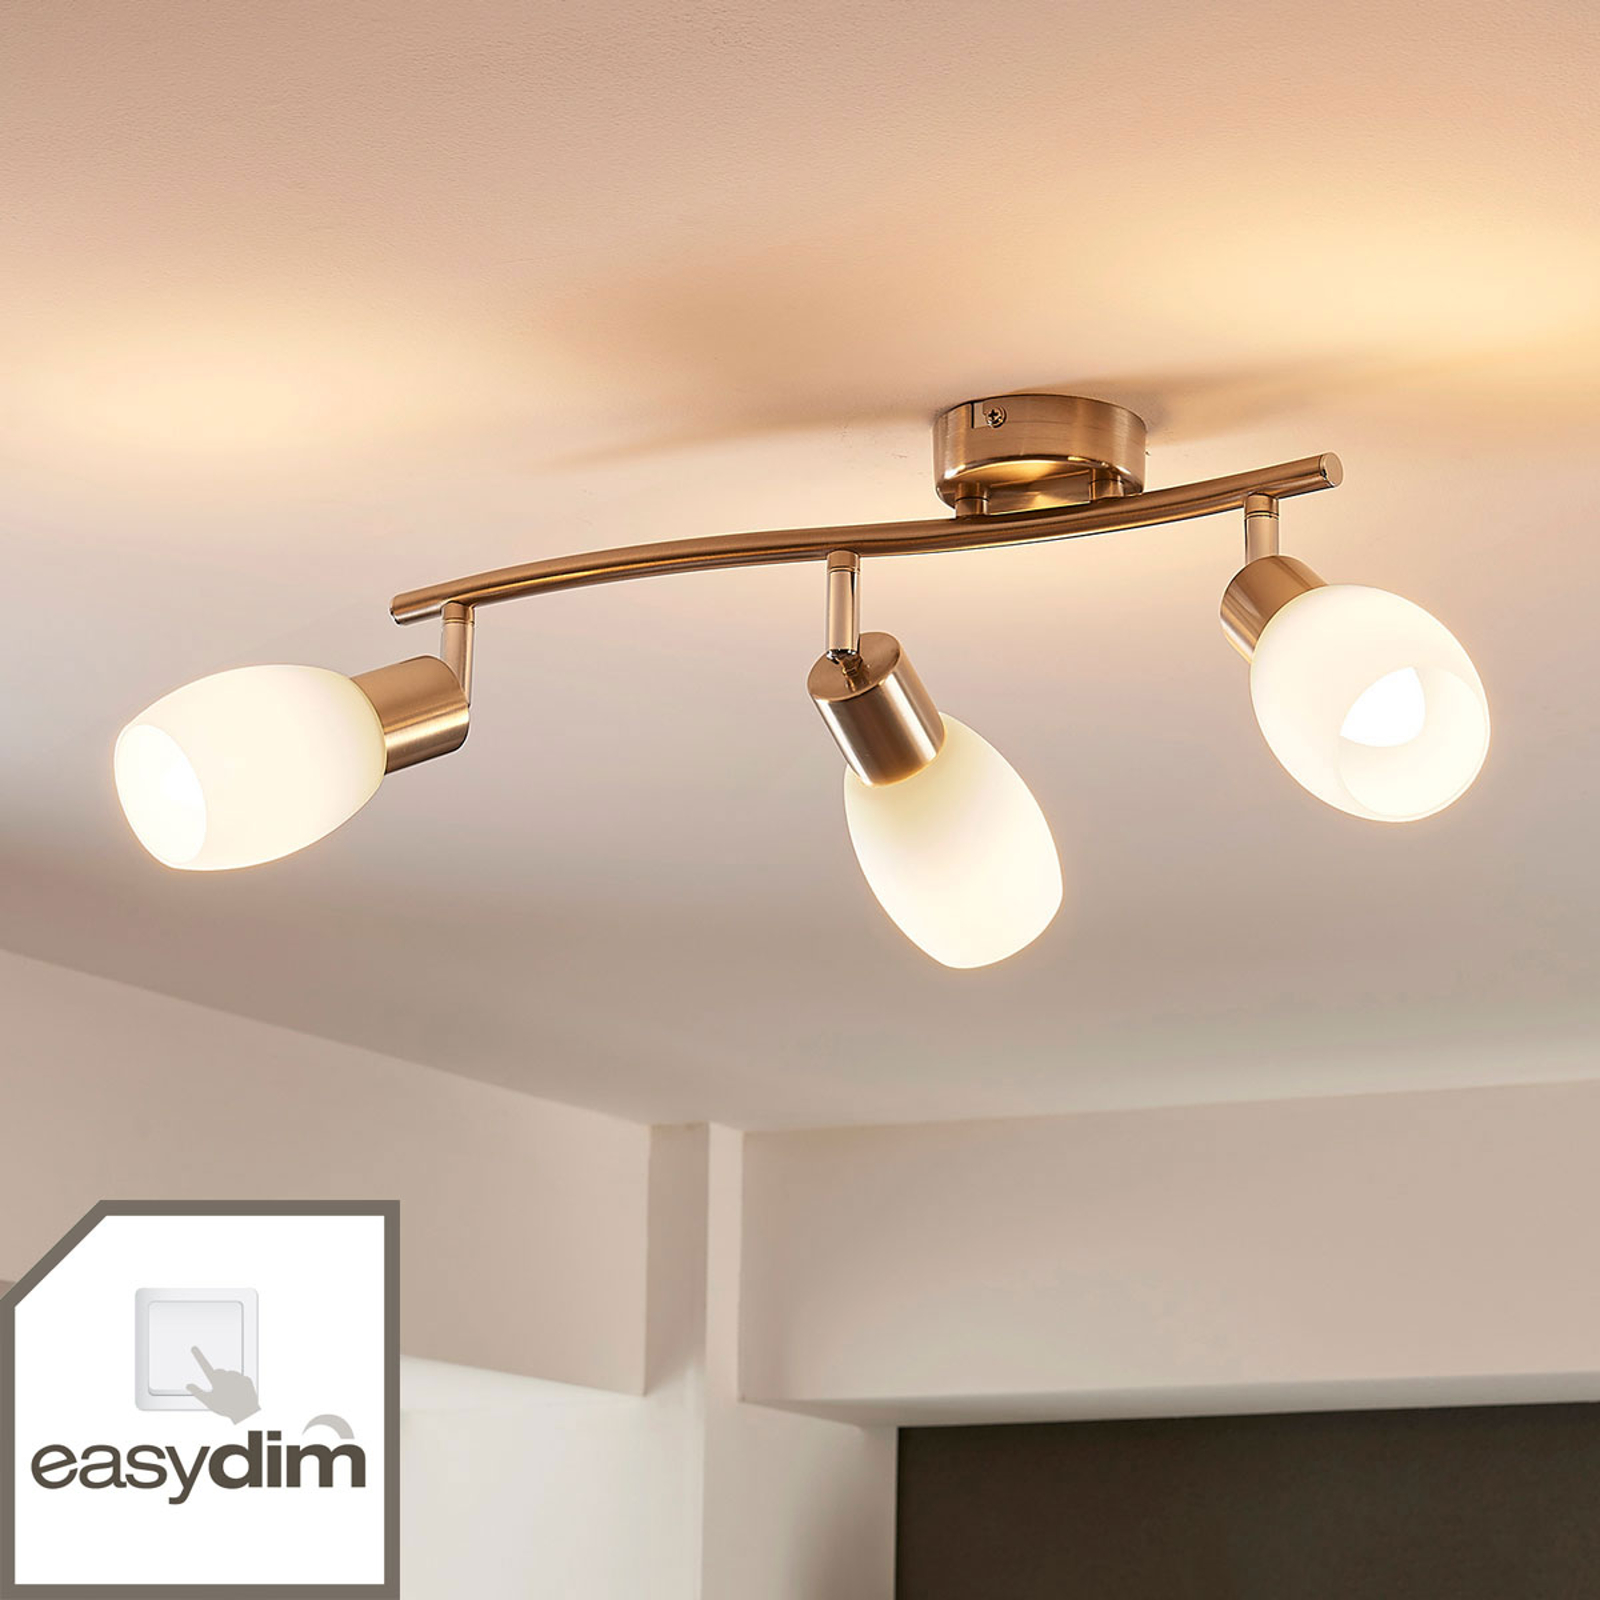 LED-takspott Arda med tre lys, dimbar